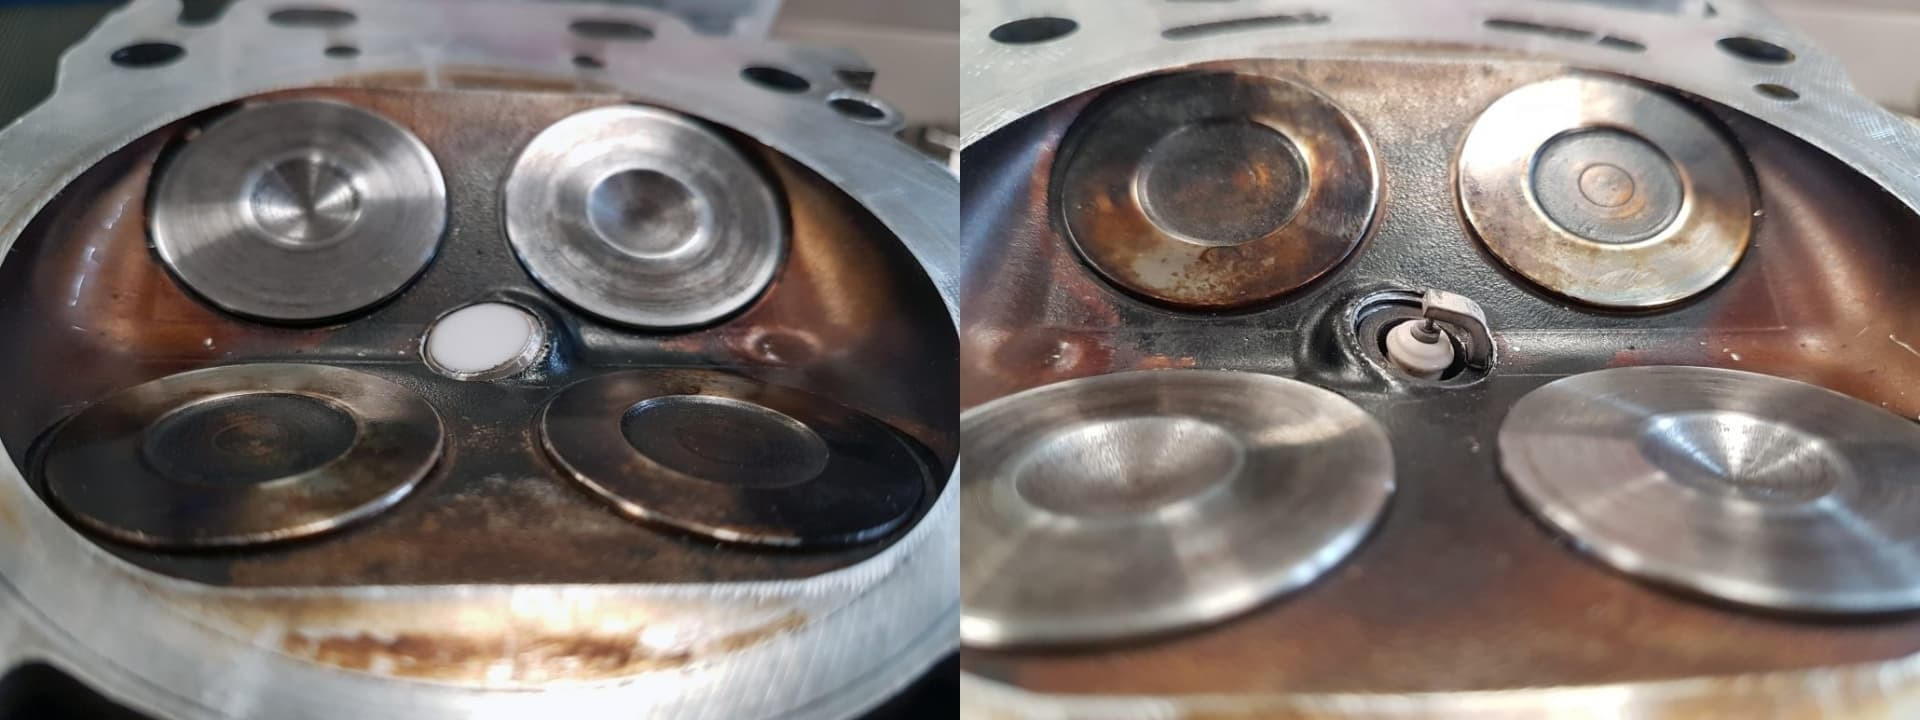 Jaque Diesel Encendido Microondas